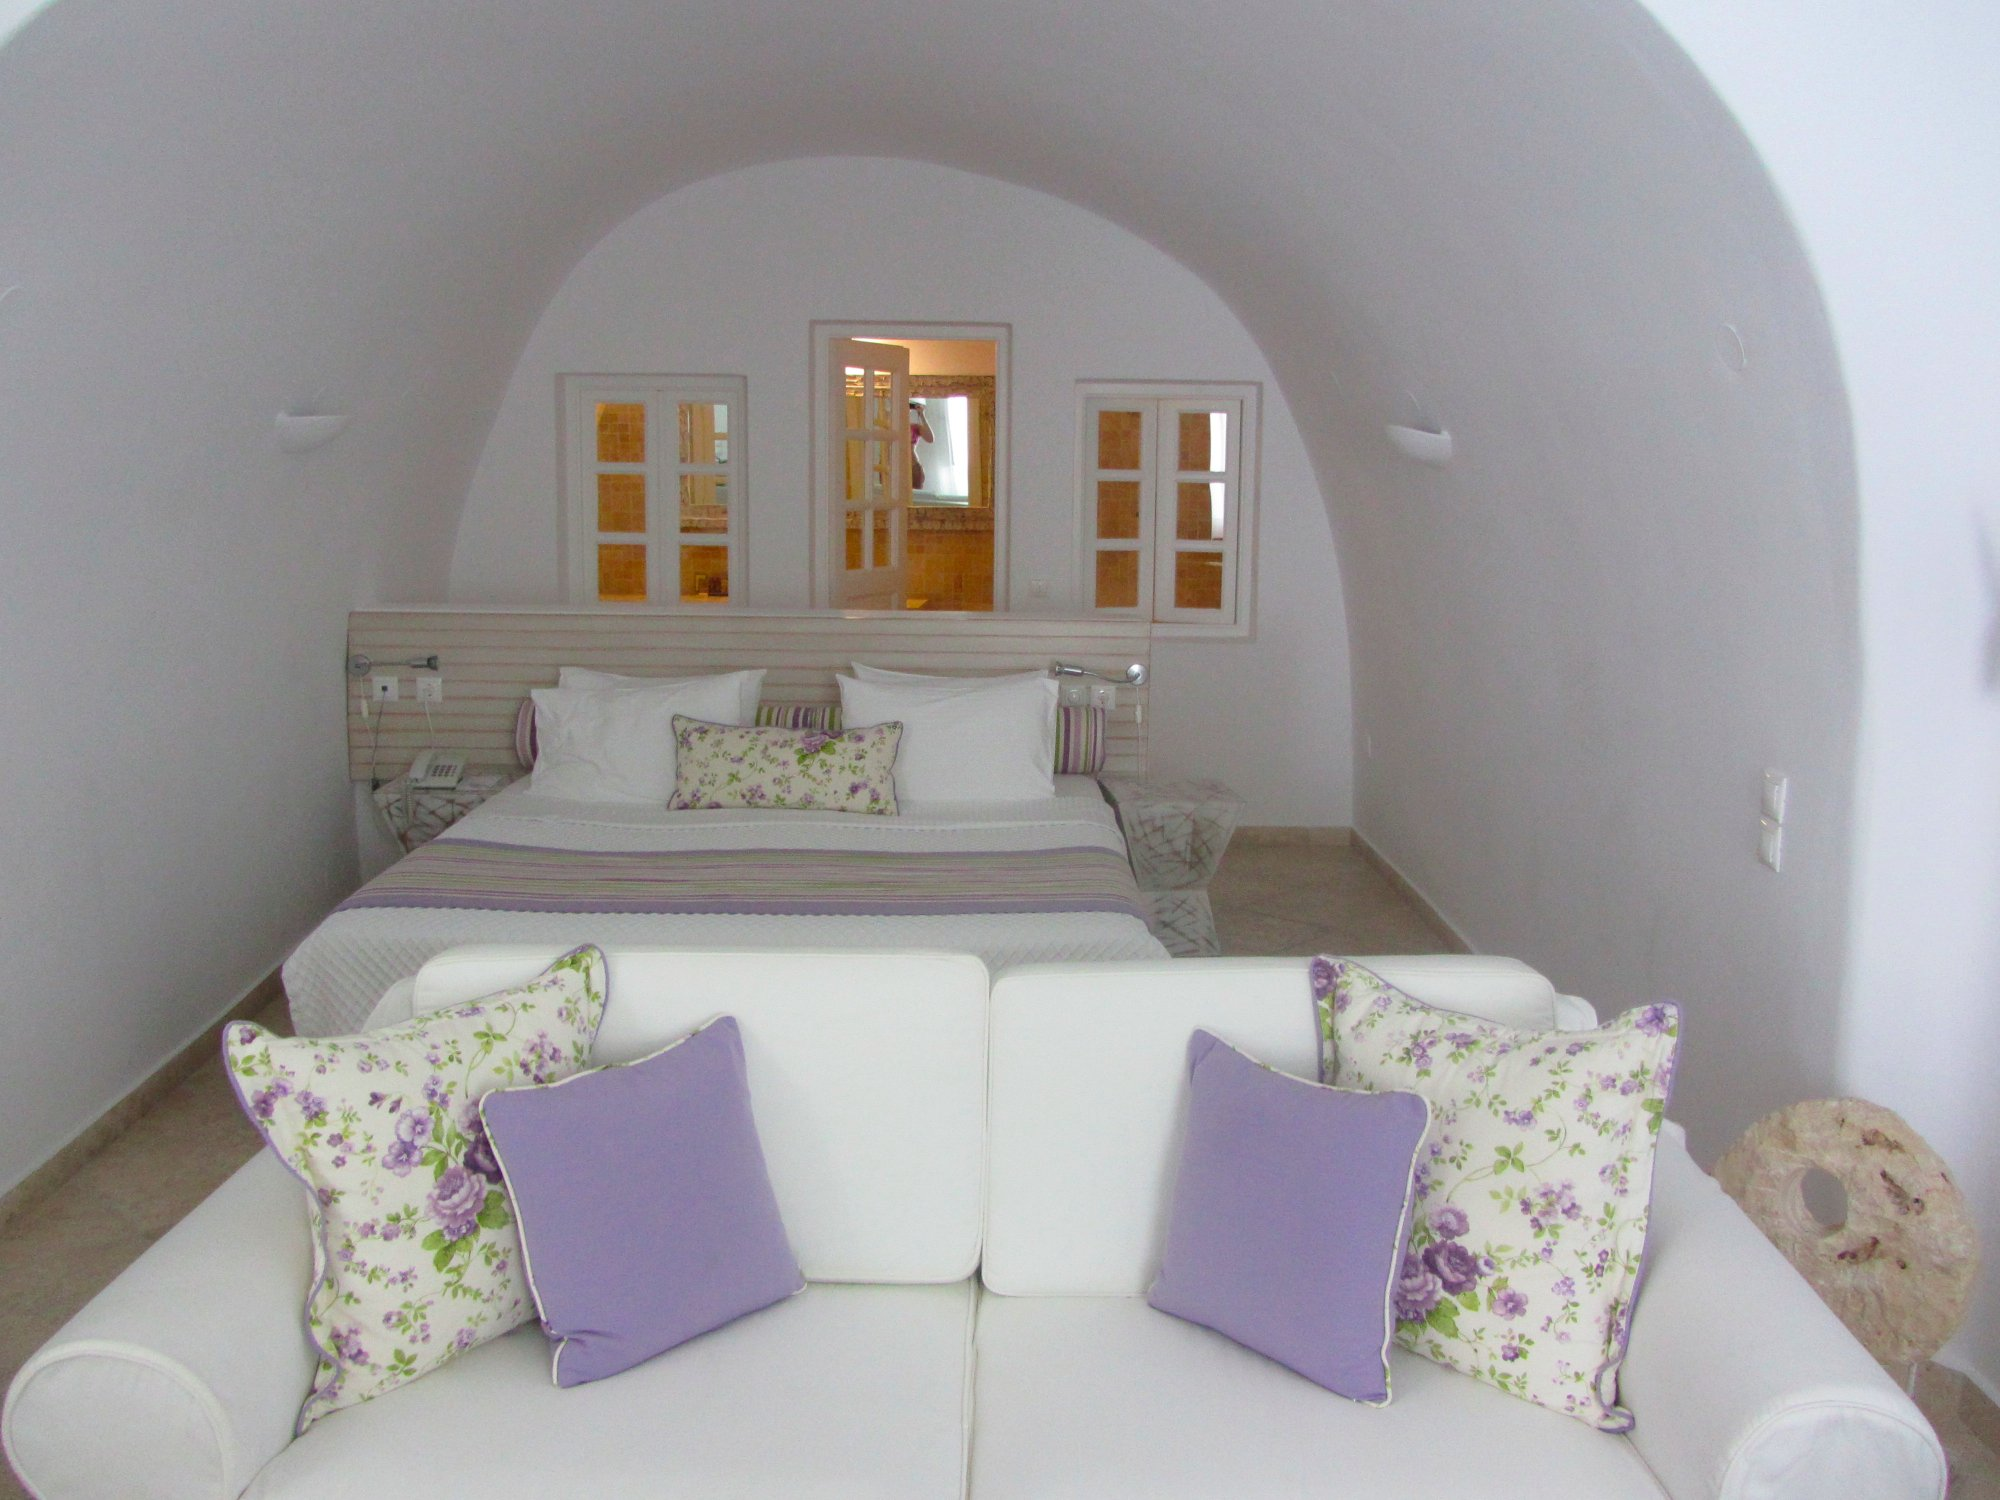 San Antonio Hotel Suites 2 Bedroom San Antonio Suites Updated 2017 Hotel Reviews Price Comparison